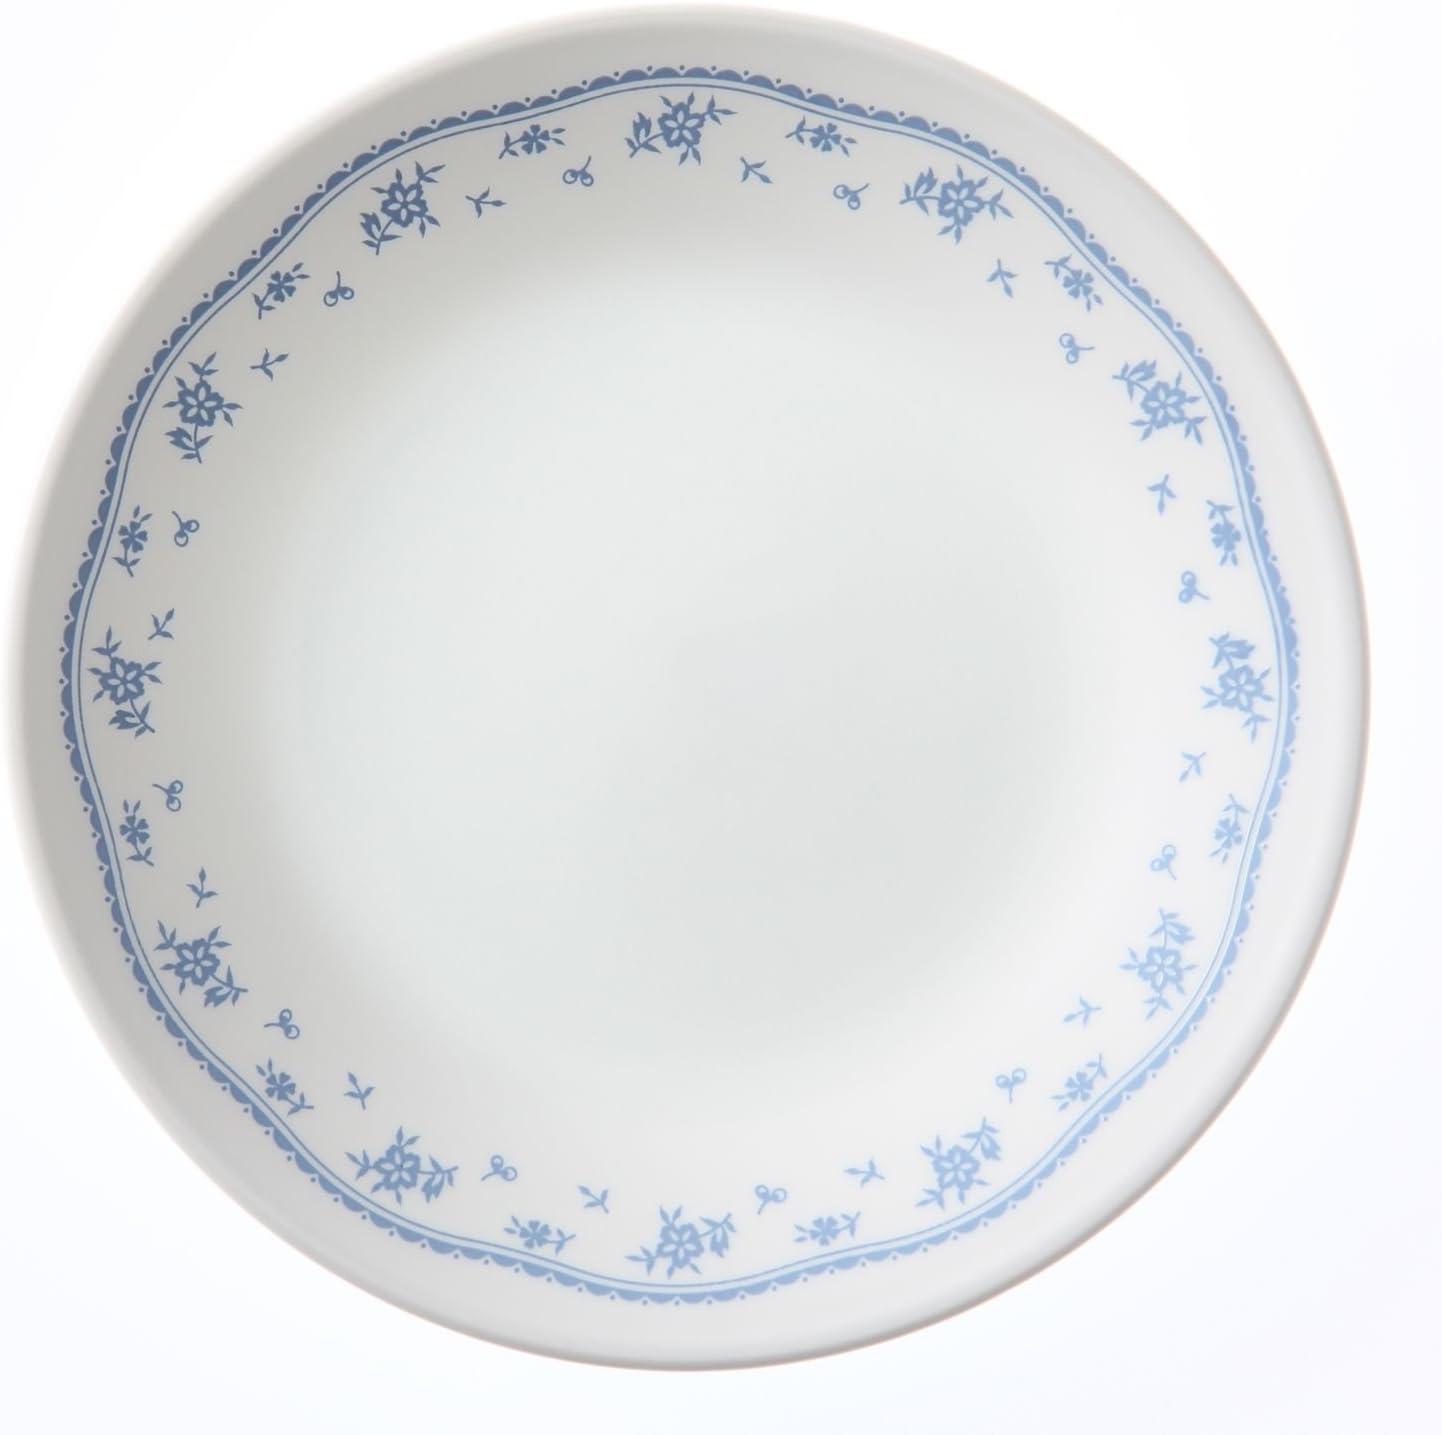 Corelle Livingware Morning Blue 8 Salad Luncheon Plate by CORELLE